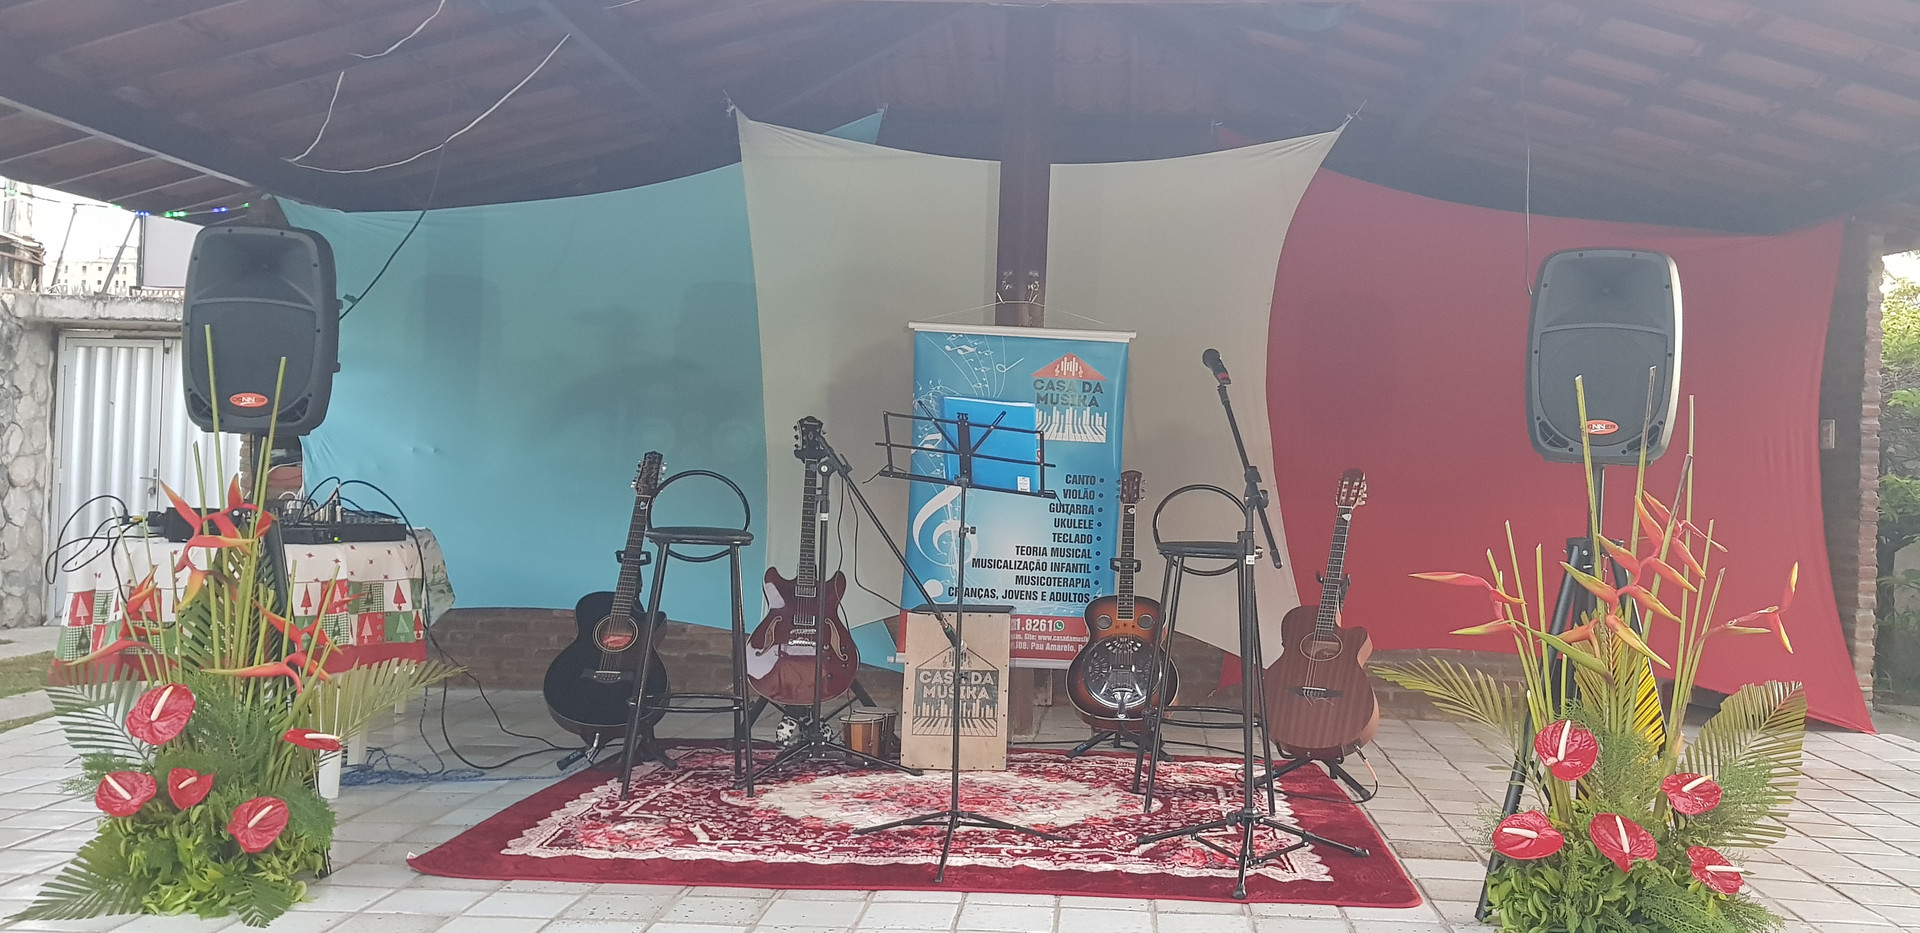 Palco - Casa da Musika